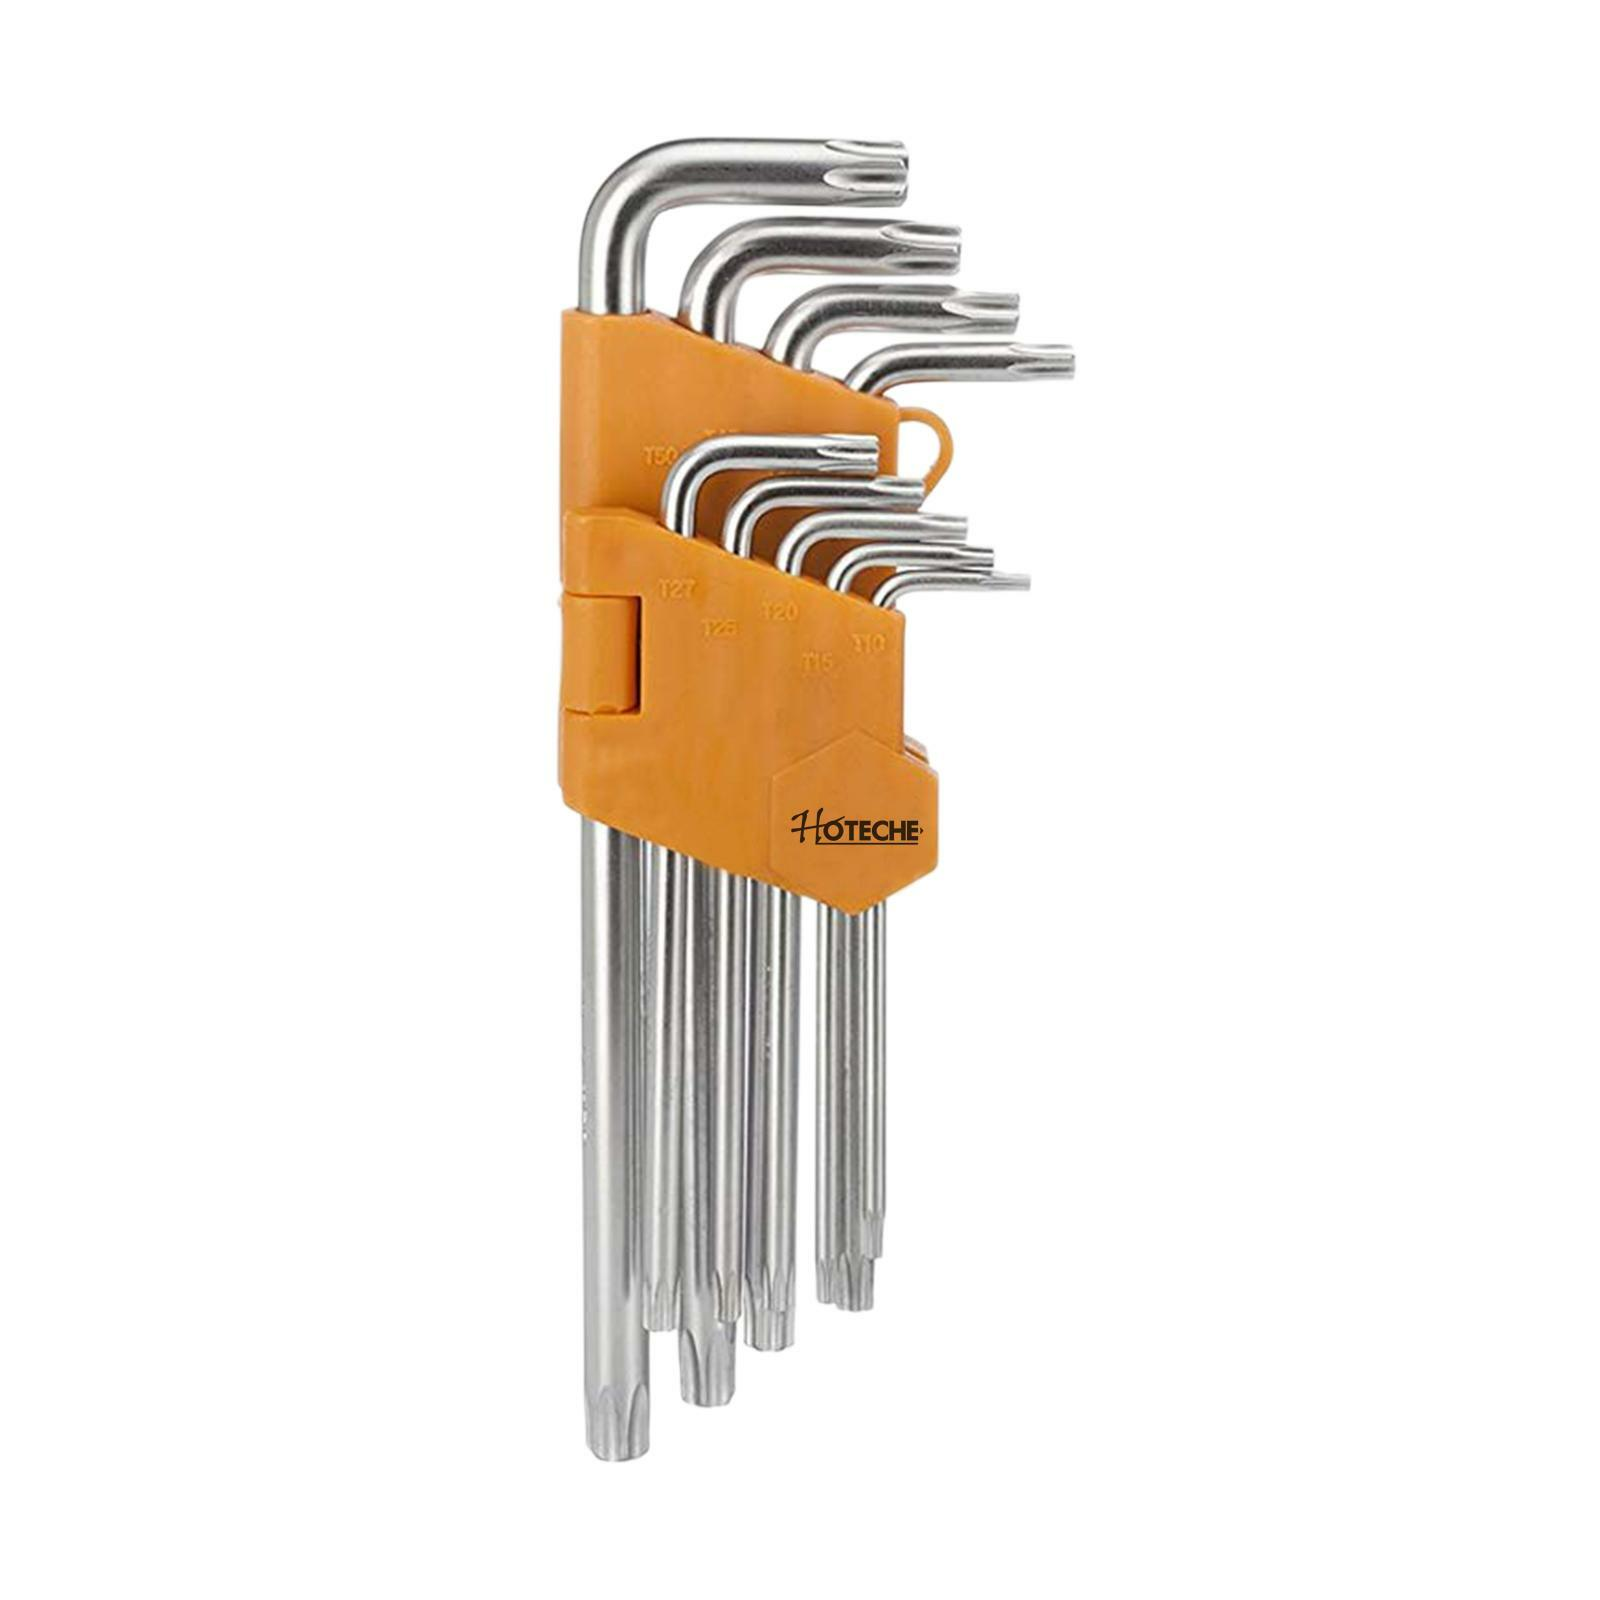 oxford chiavi torx 9 pezzi t-10 / t-50 cromo vanadio hoteche